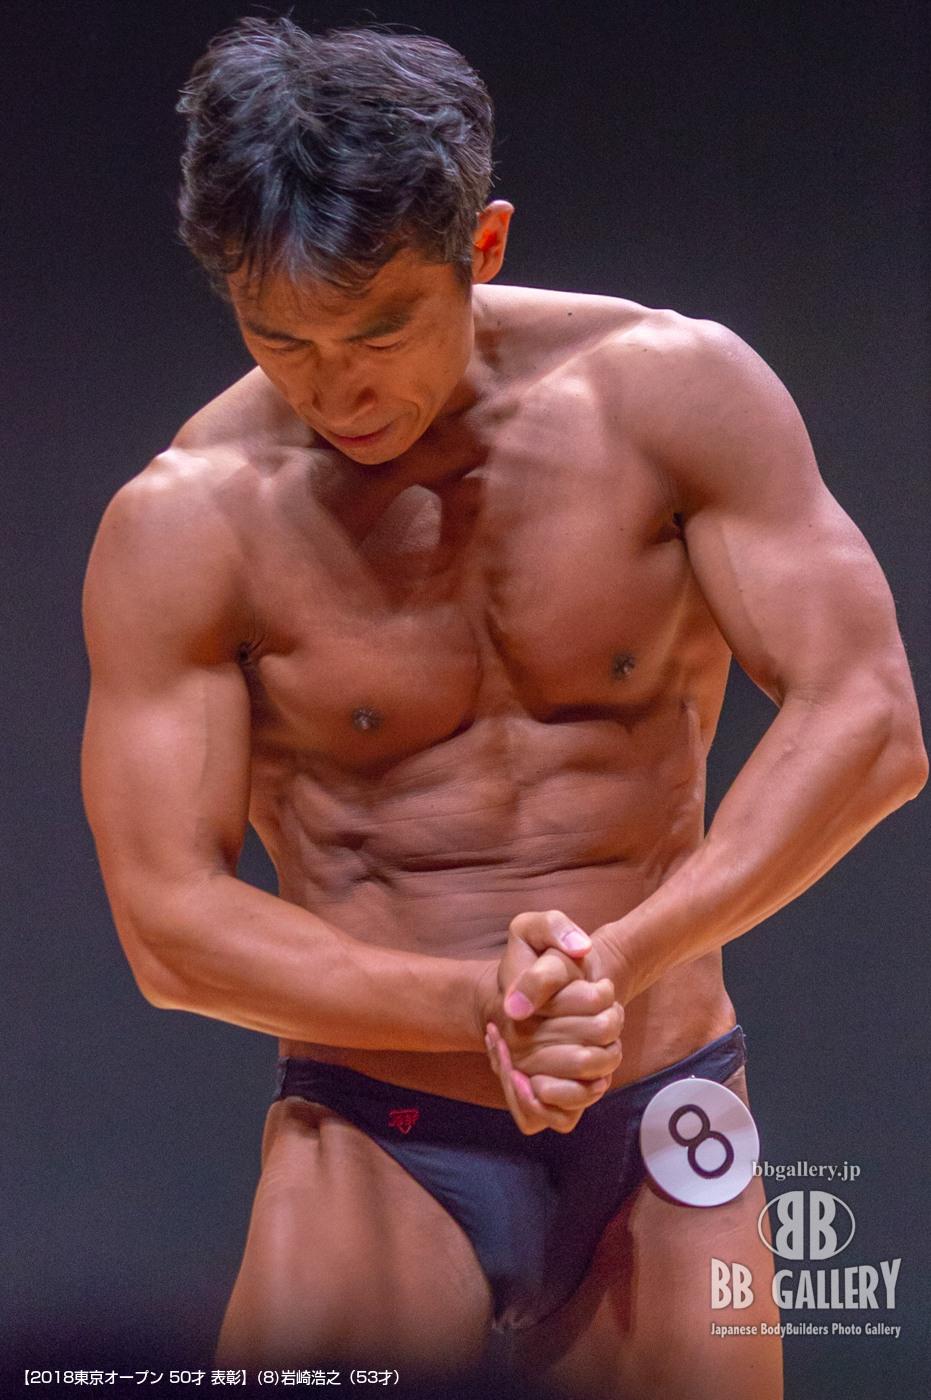 【2018東京オープン 50才 表彰】(8)岩崎浩之(53才)